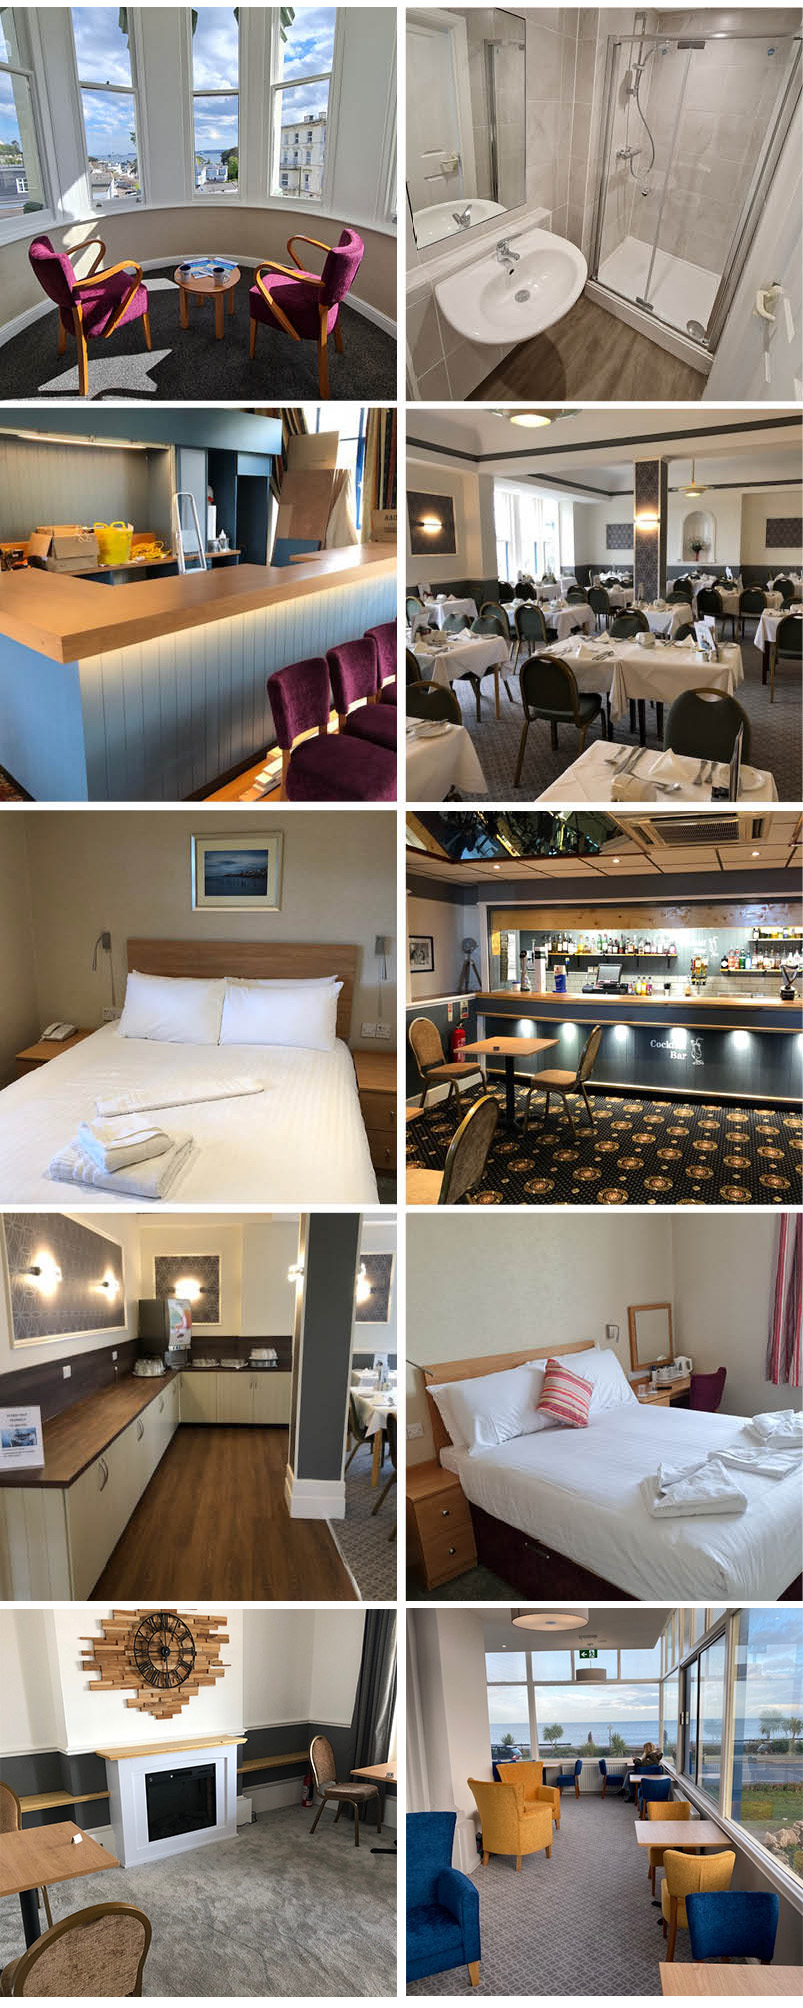 leisureplex refurbished uk seaside hotels